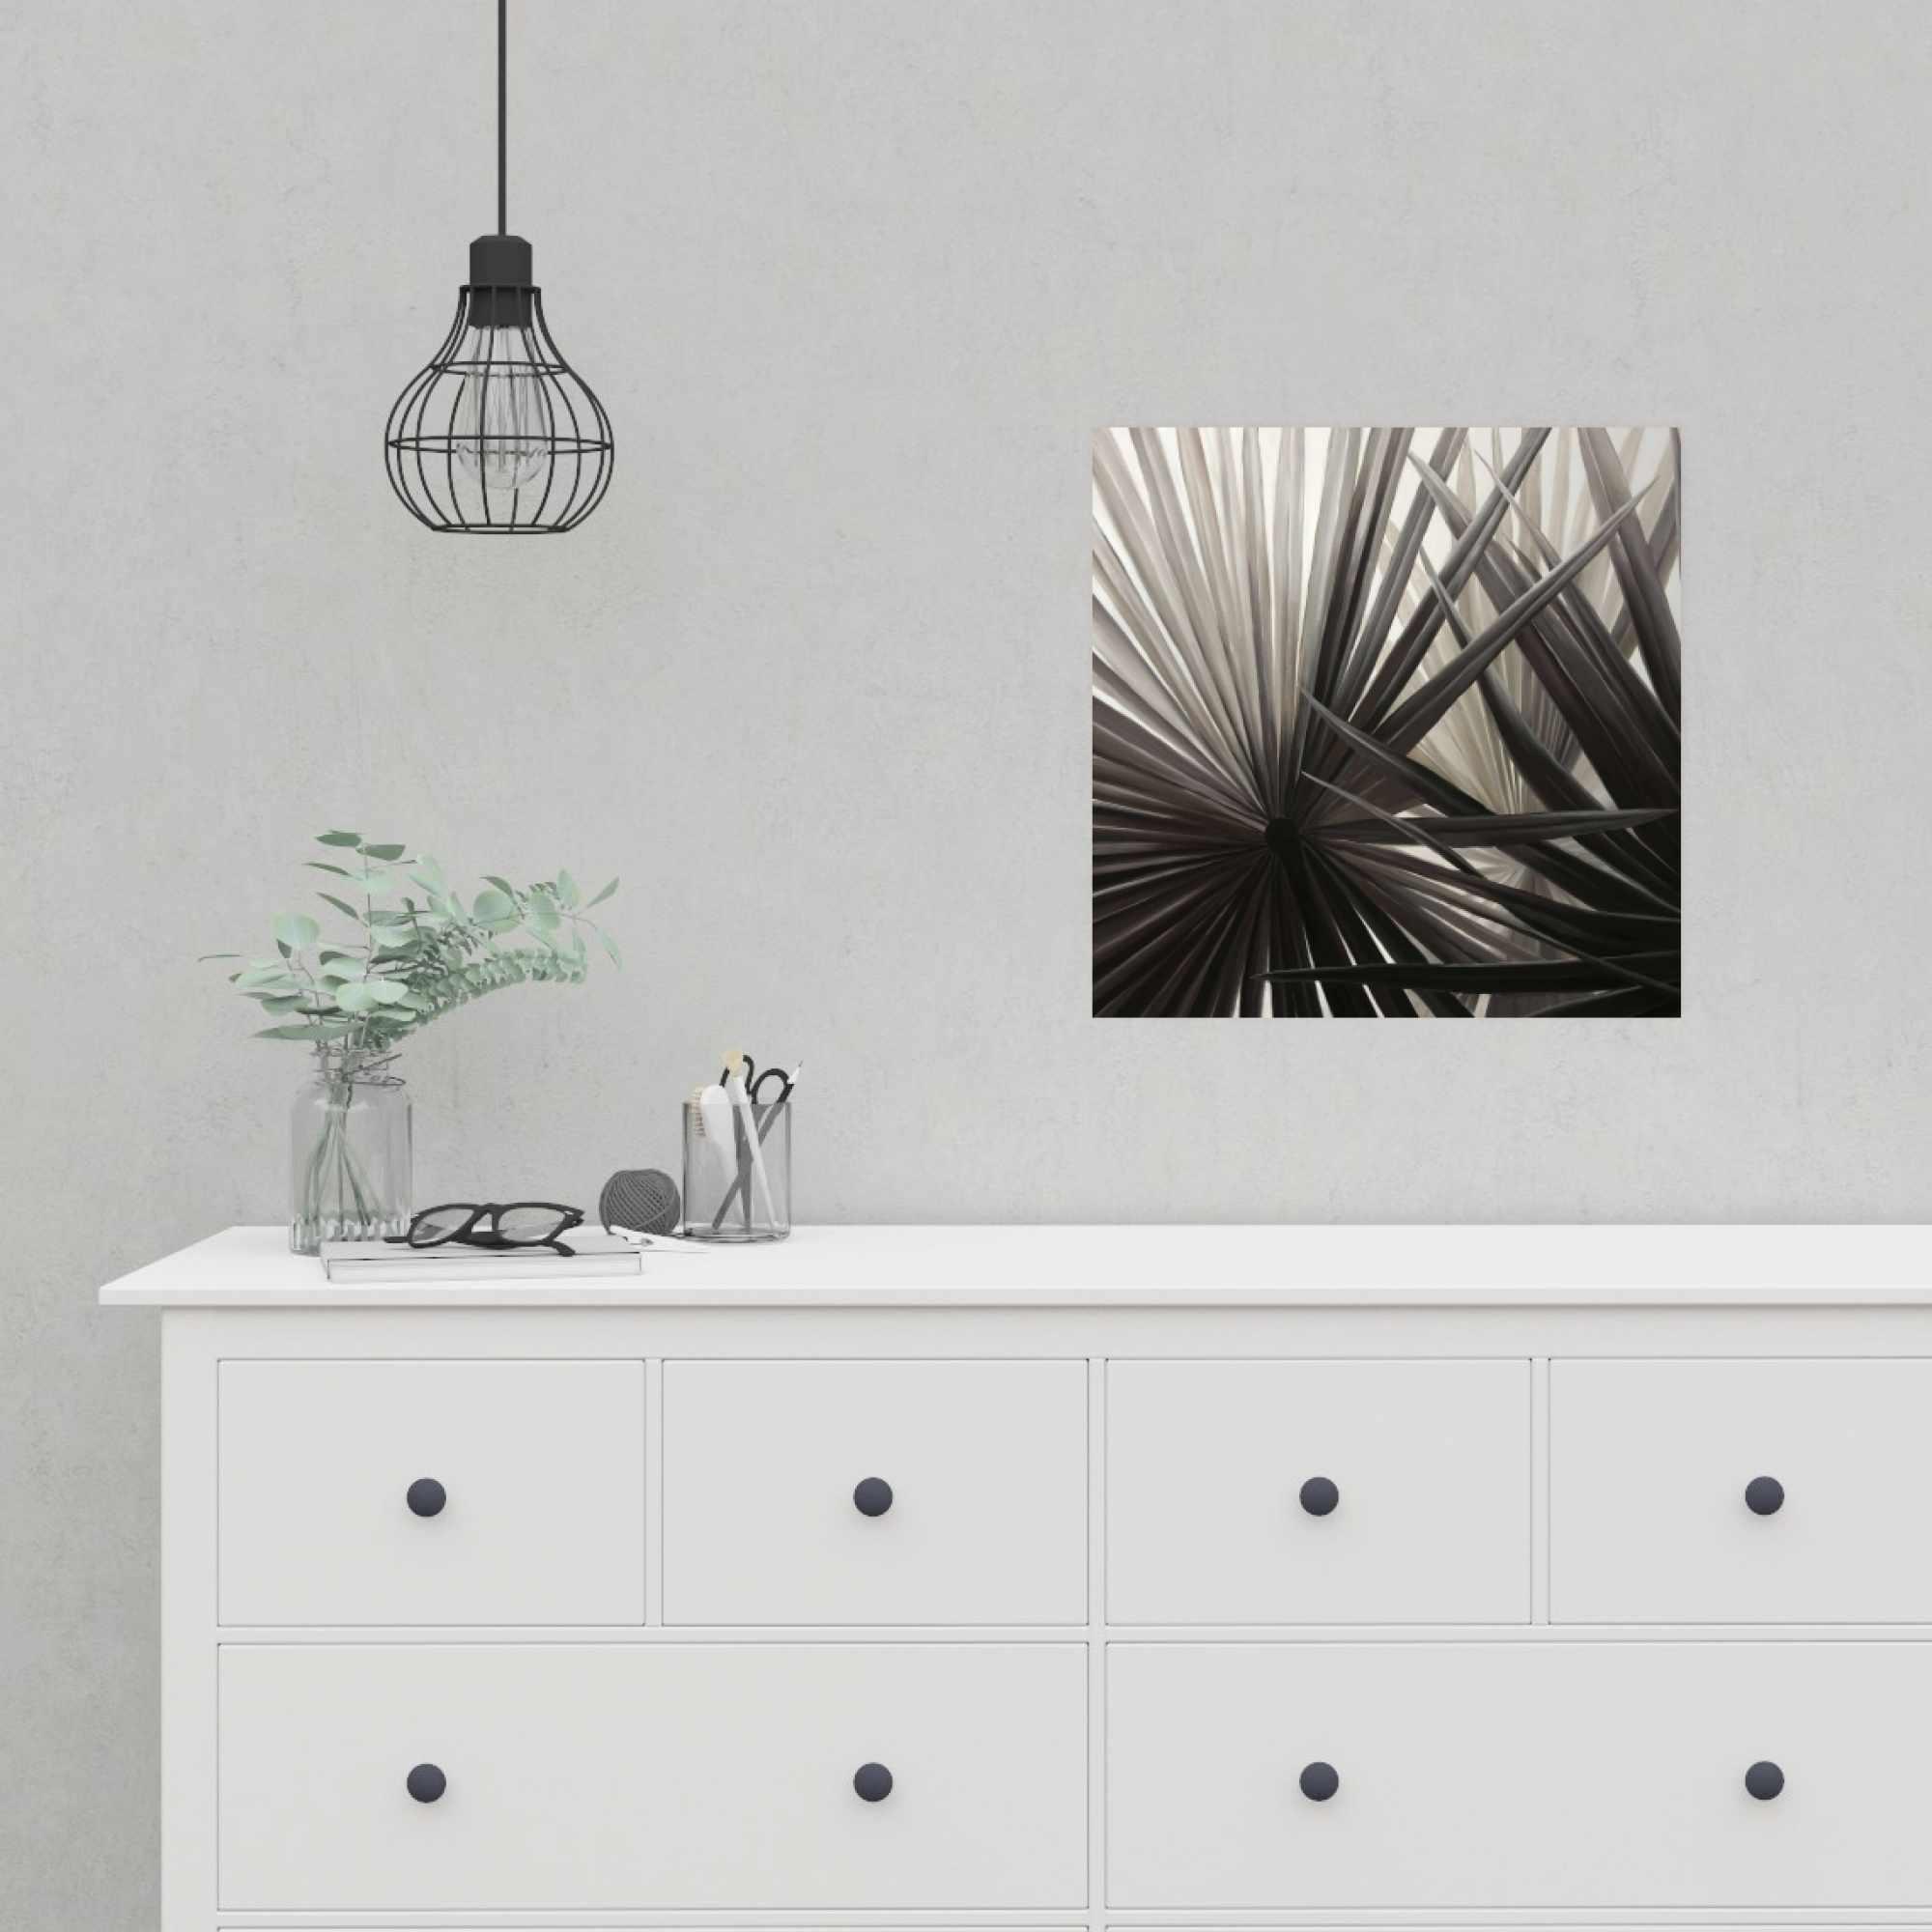 Poster 16 x 16 - Sepia tropical plants